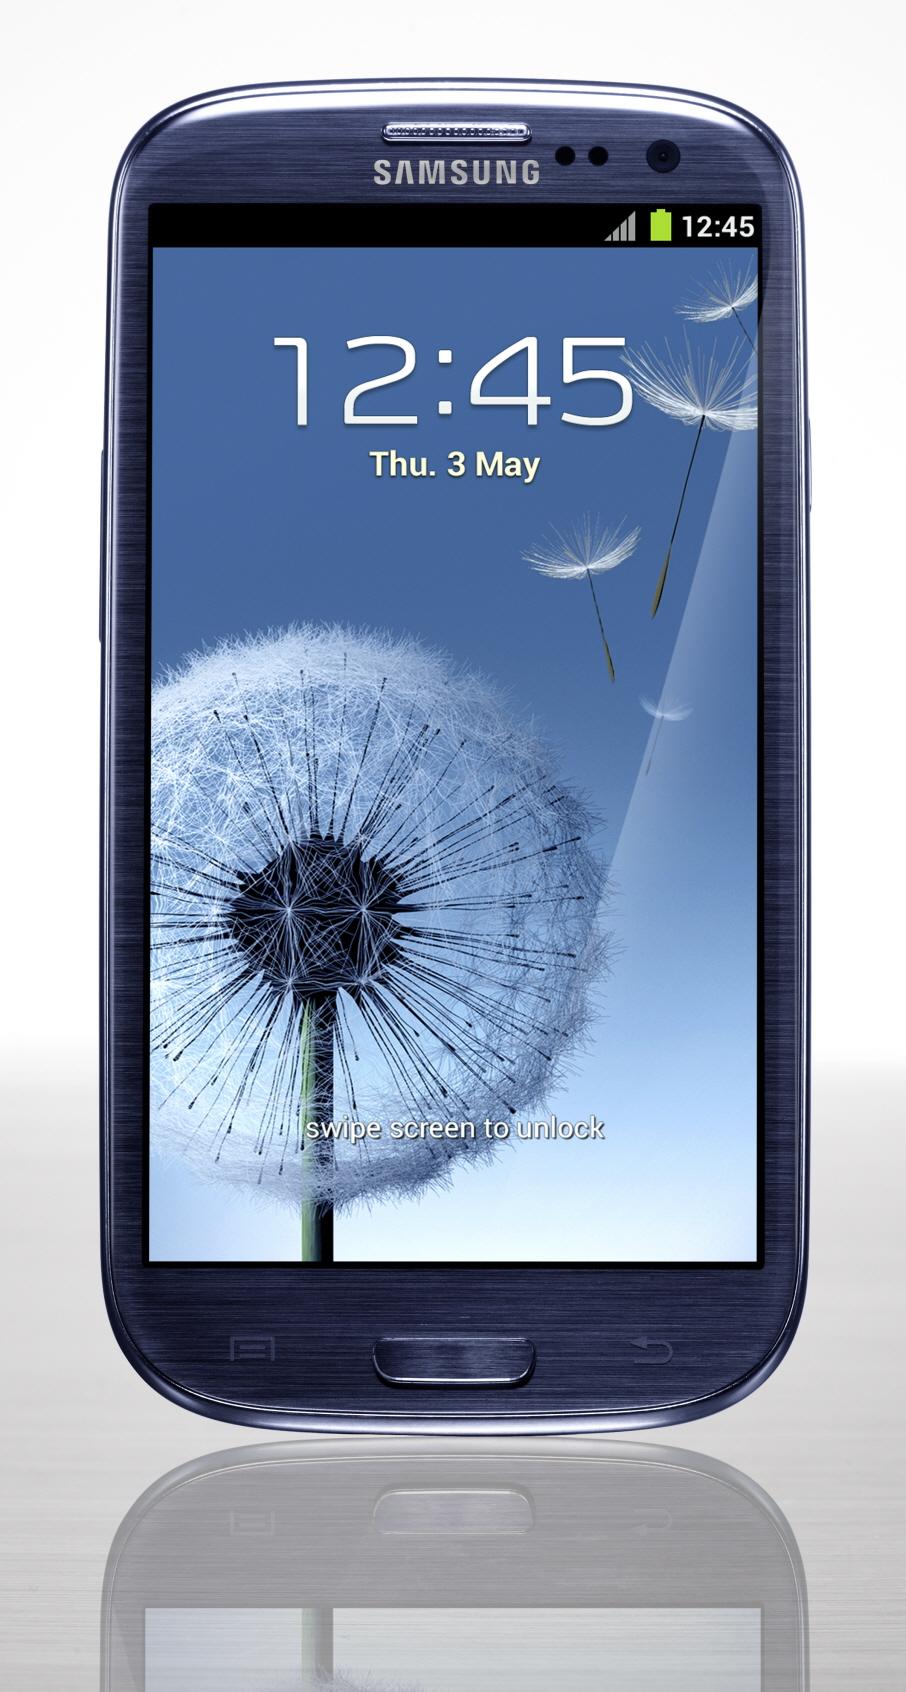 Samsung galaxy 2 plus совершенно случайно появился на cebit 2013 фото